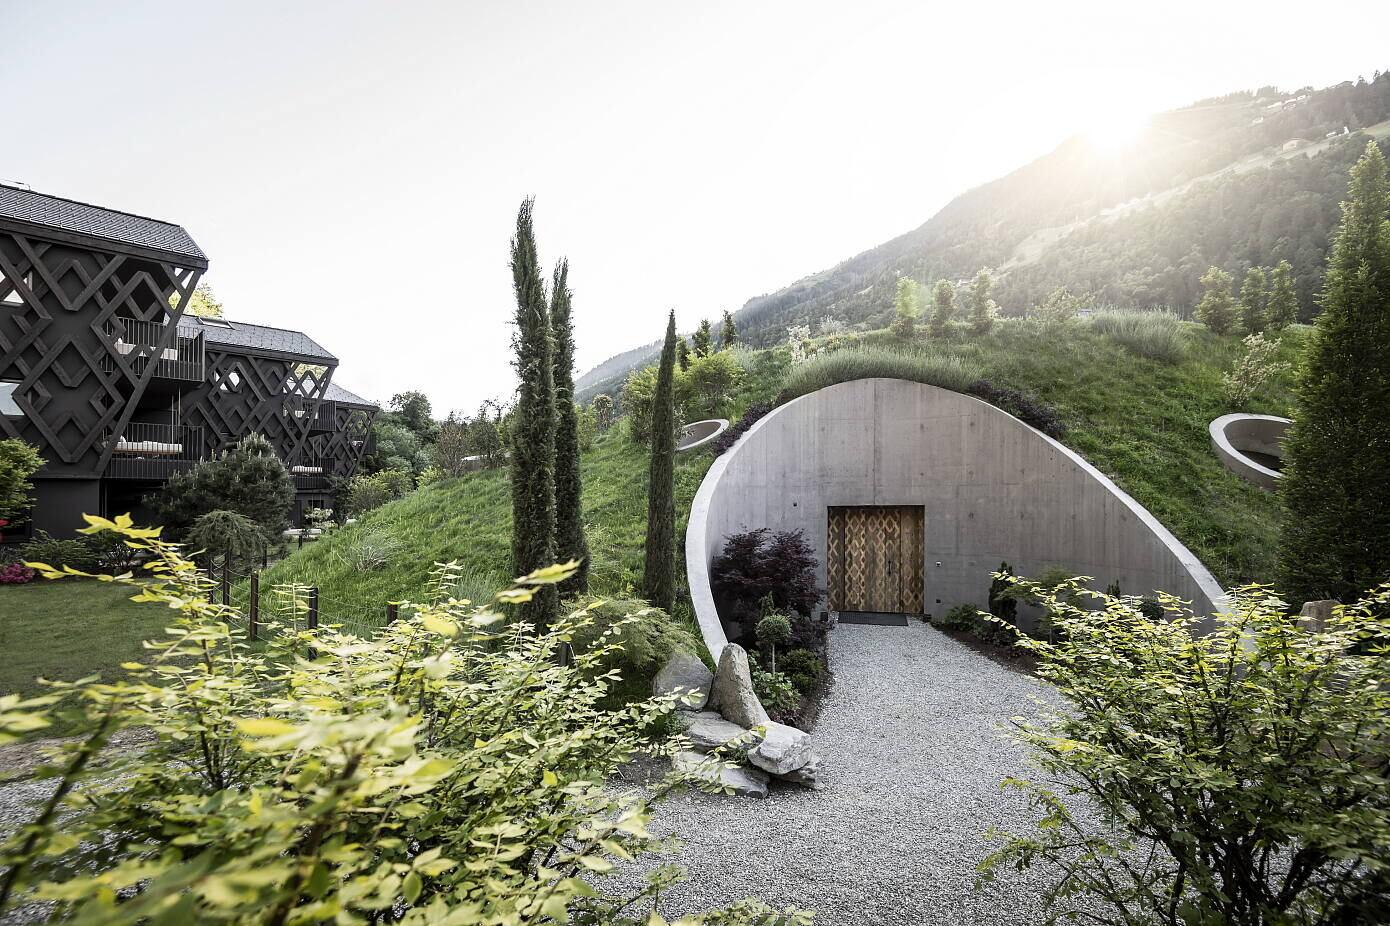 Apfelhotel Torgglerhof by Noa* Network of Architecture